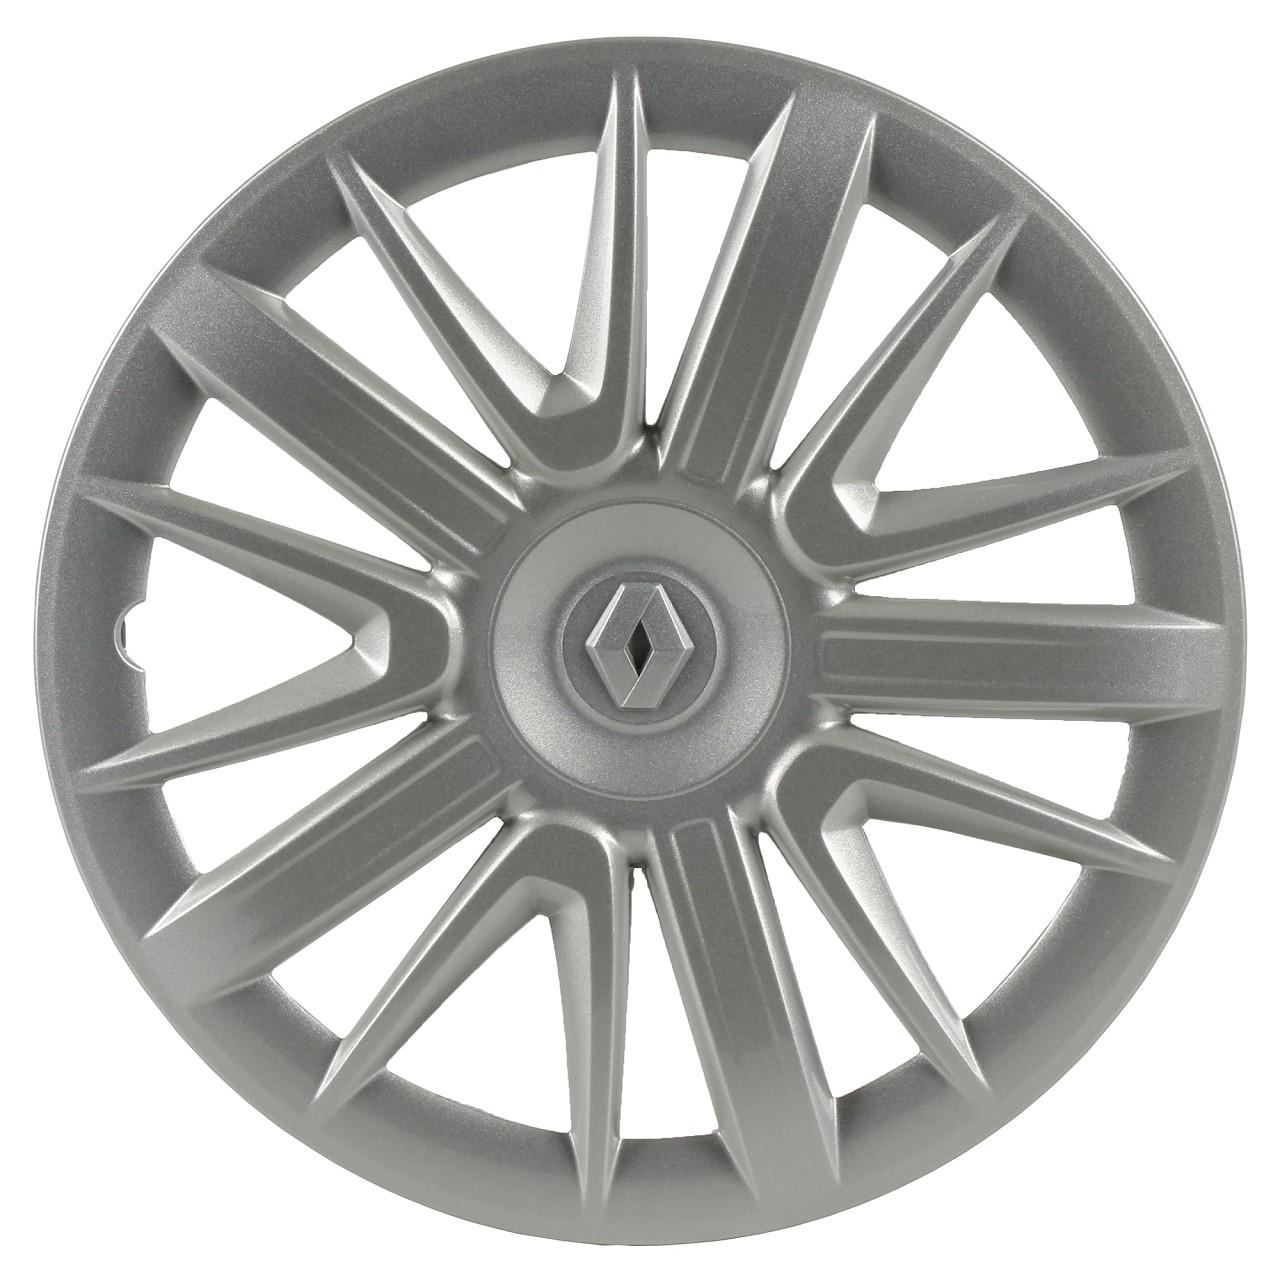 ORIGINAL Renault Radkappe Radblende SILBER 15 Zoll CLIO IV TWINGO III 7711426508